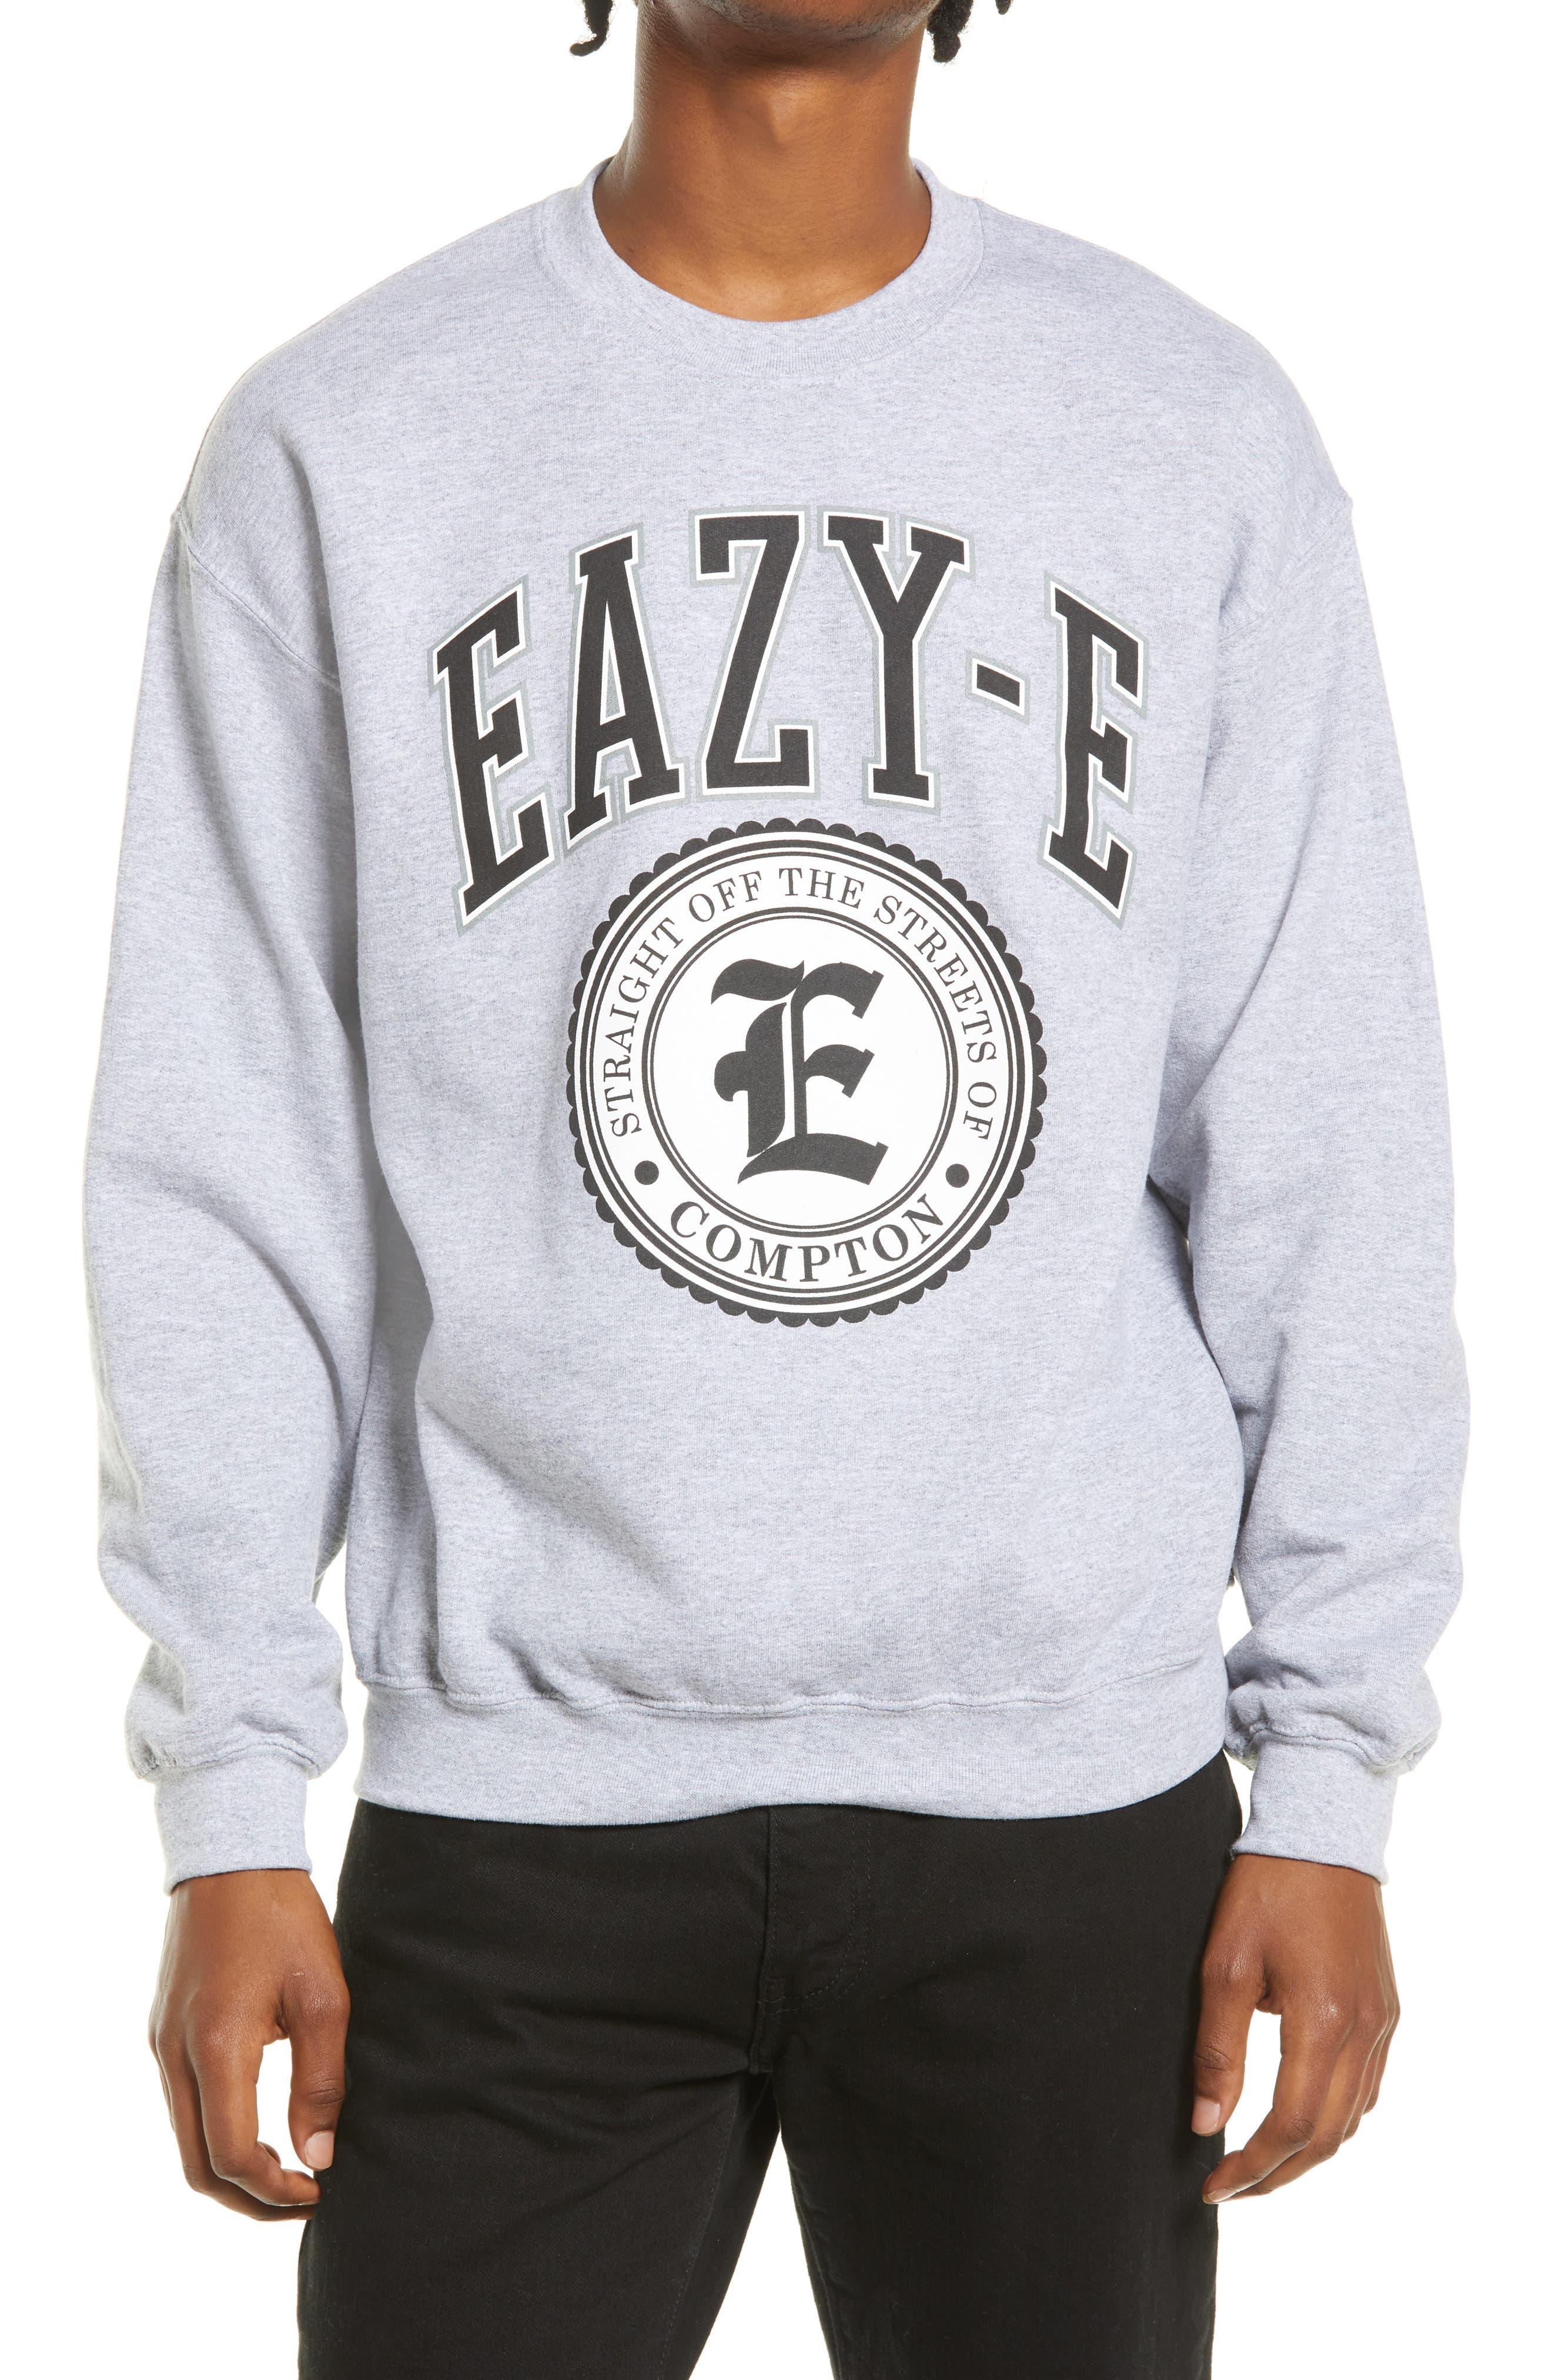 Eazy-E Crewneck Sweatshirt